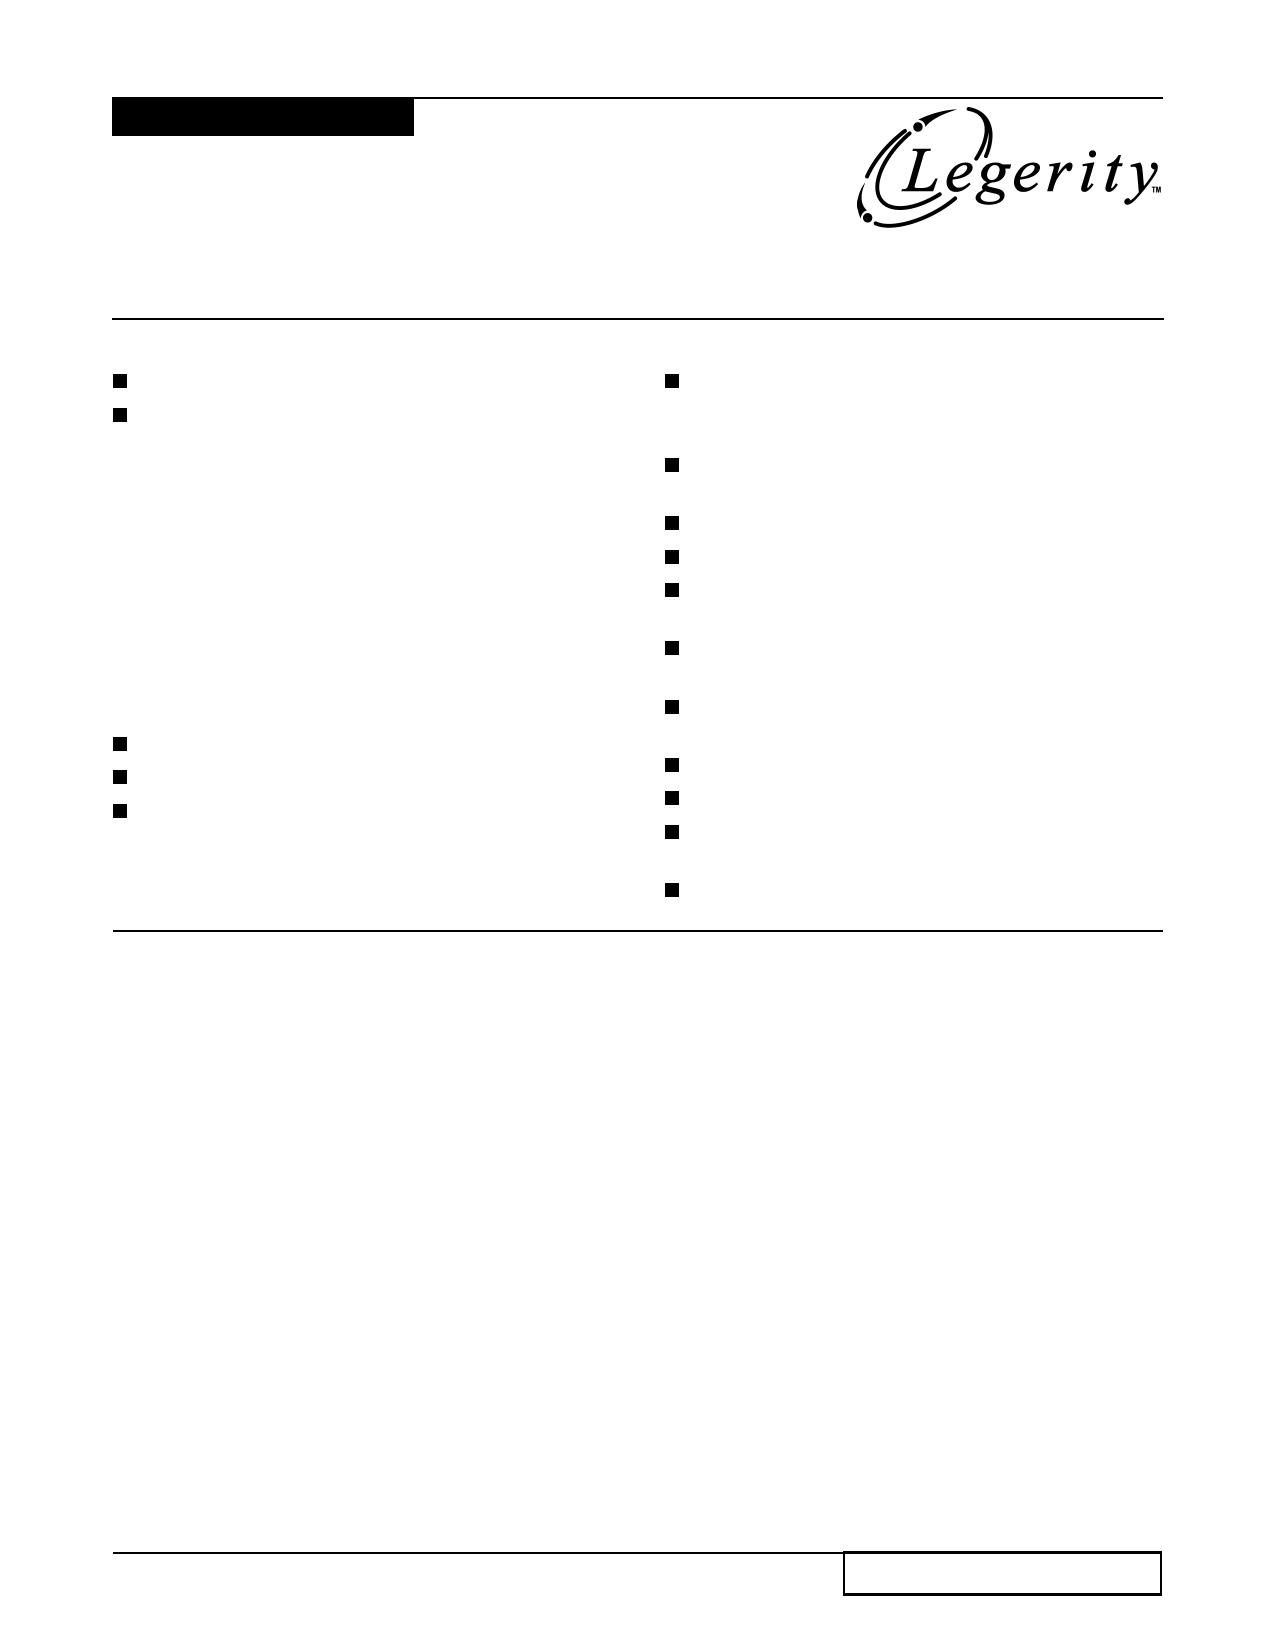 Am79Q031 데이터시트 및 Am79Q031 PDF